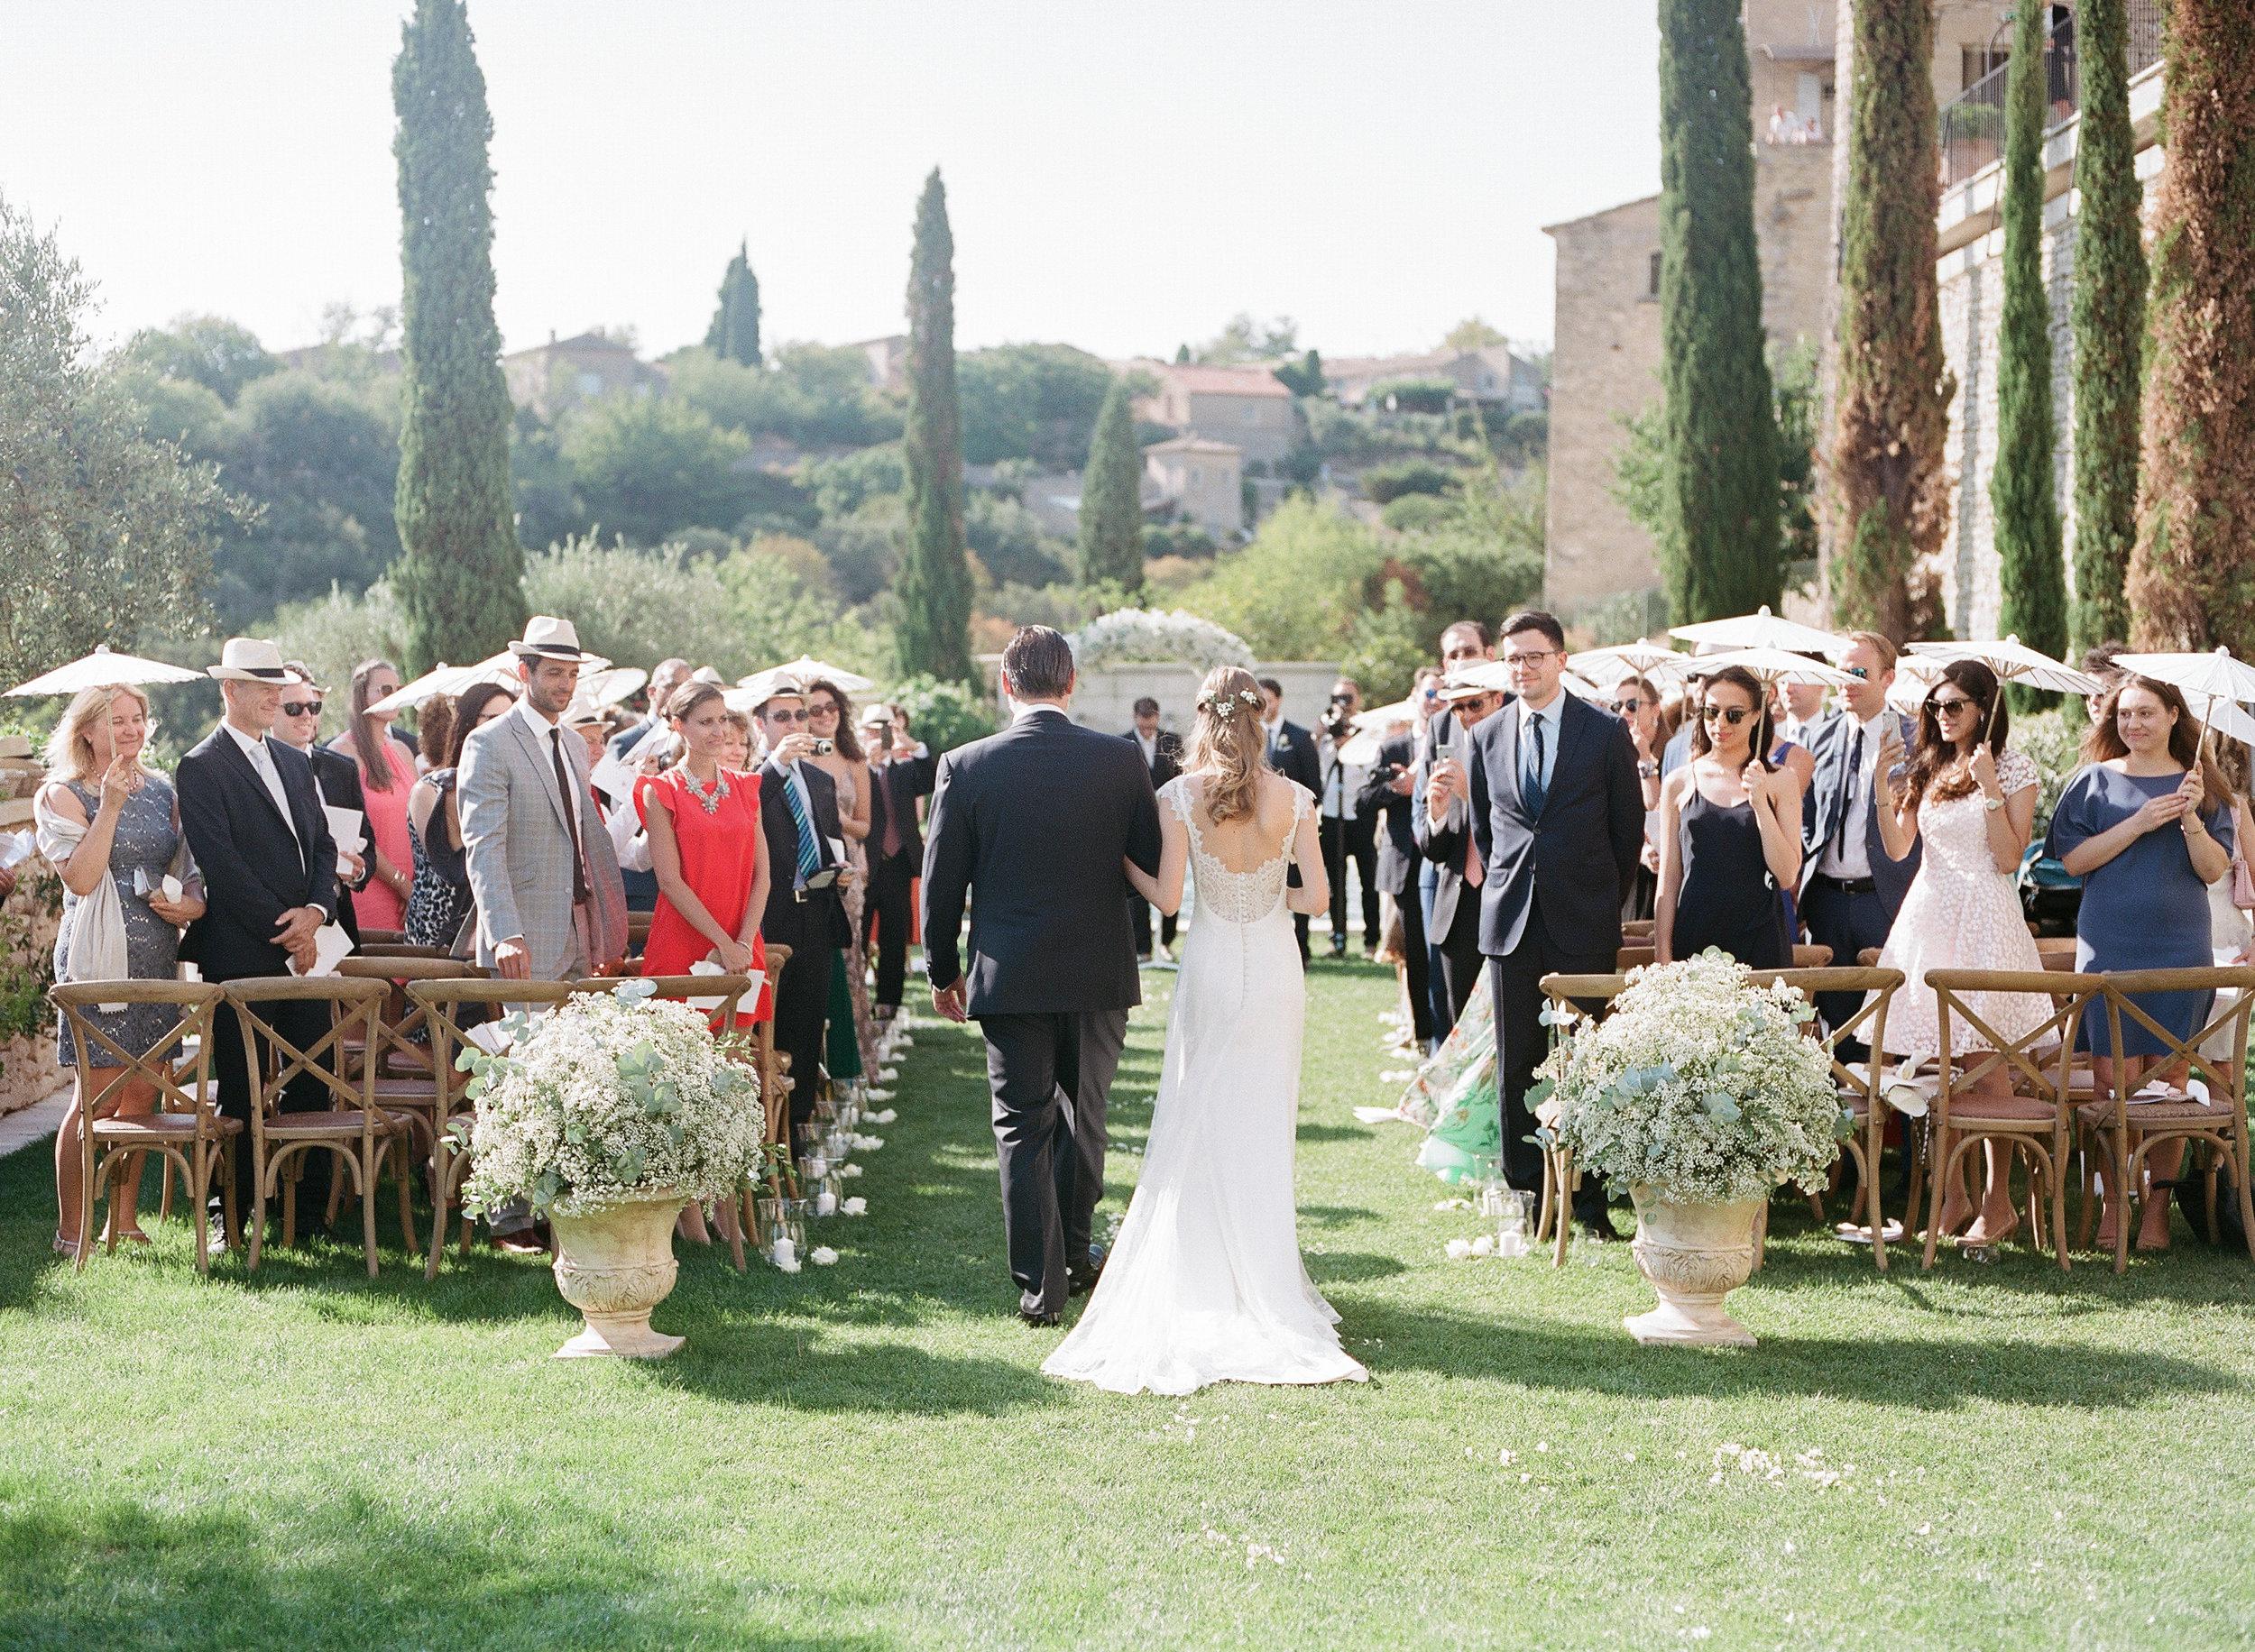 provence-wedding-rory-wylie.jpg-62.jpg